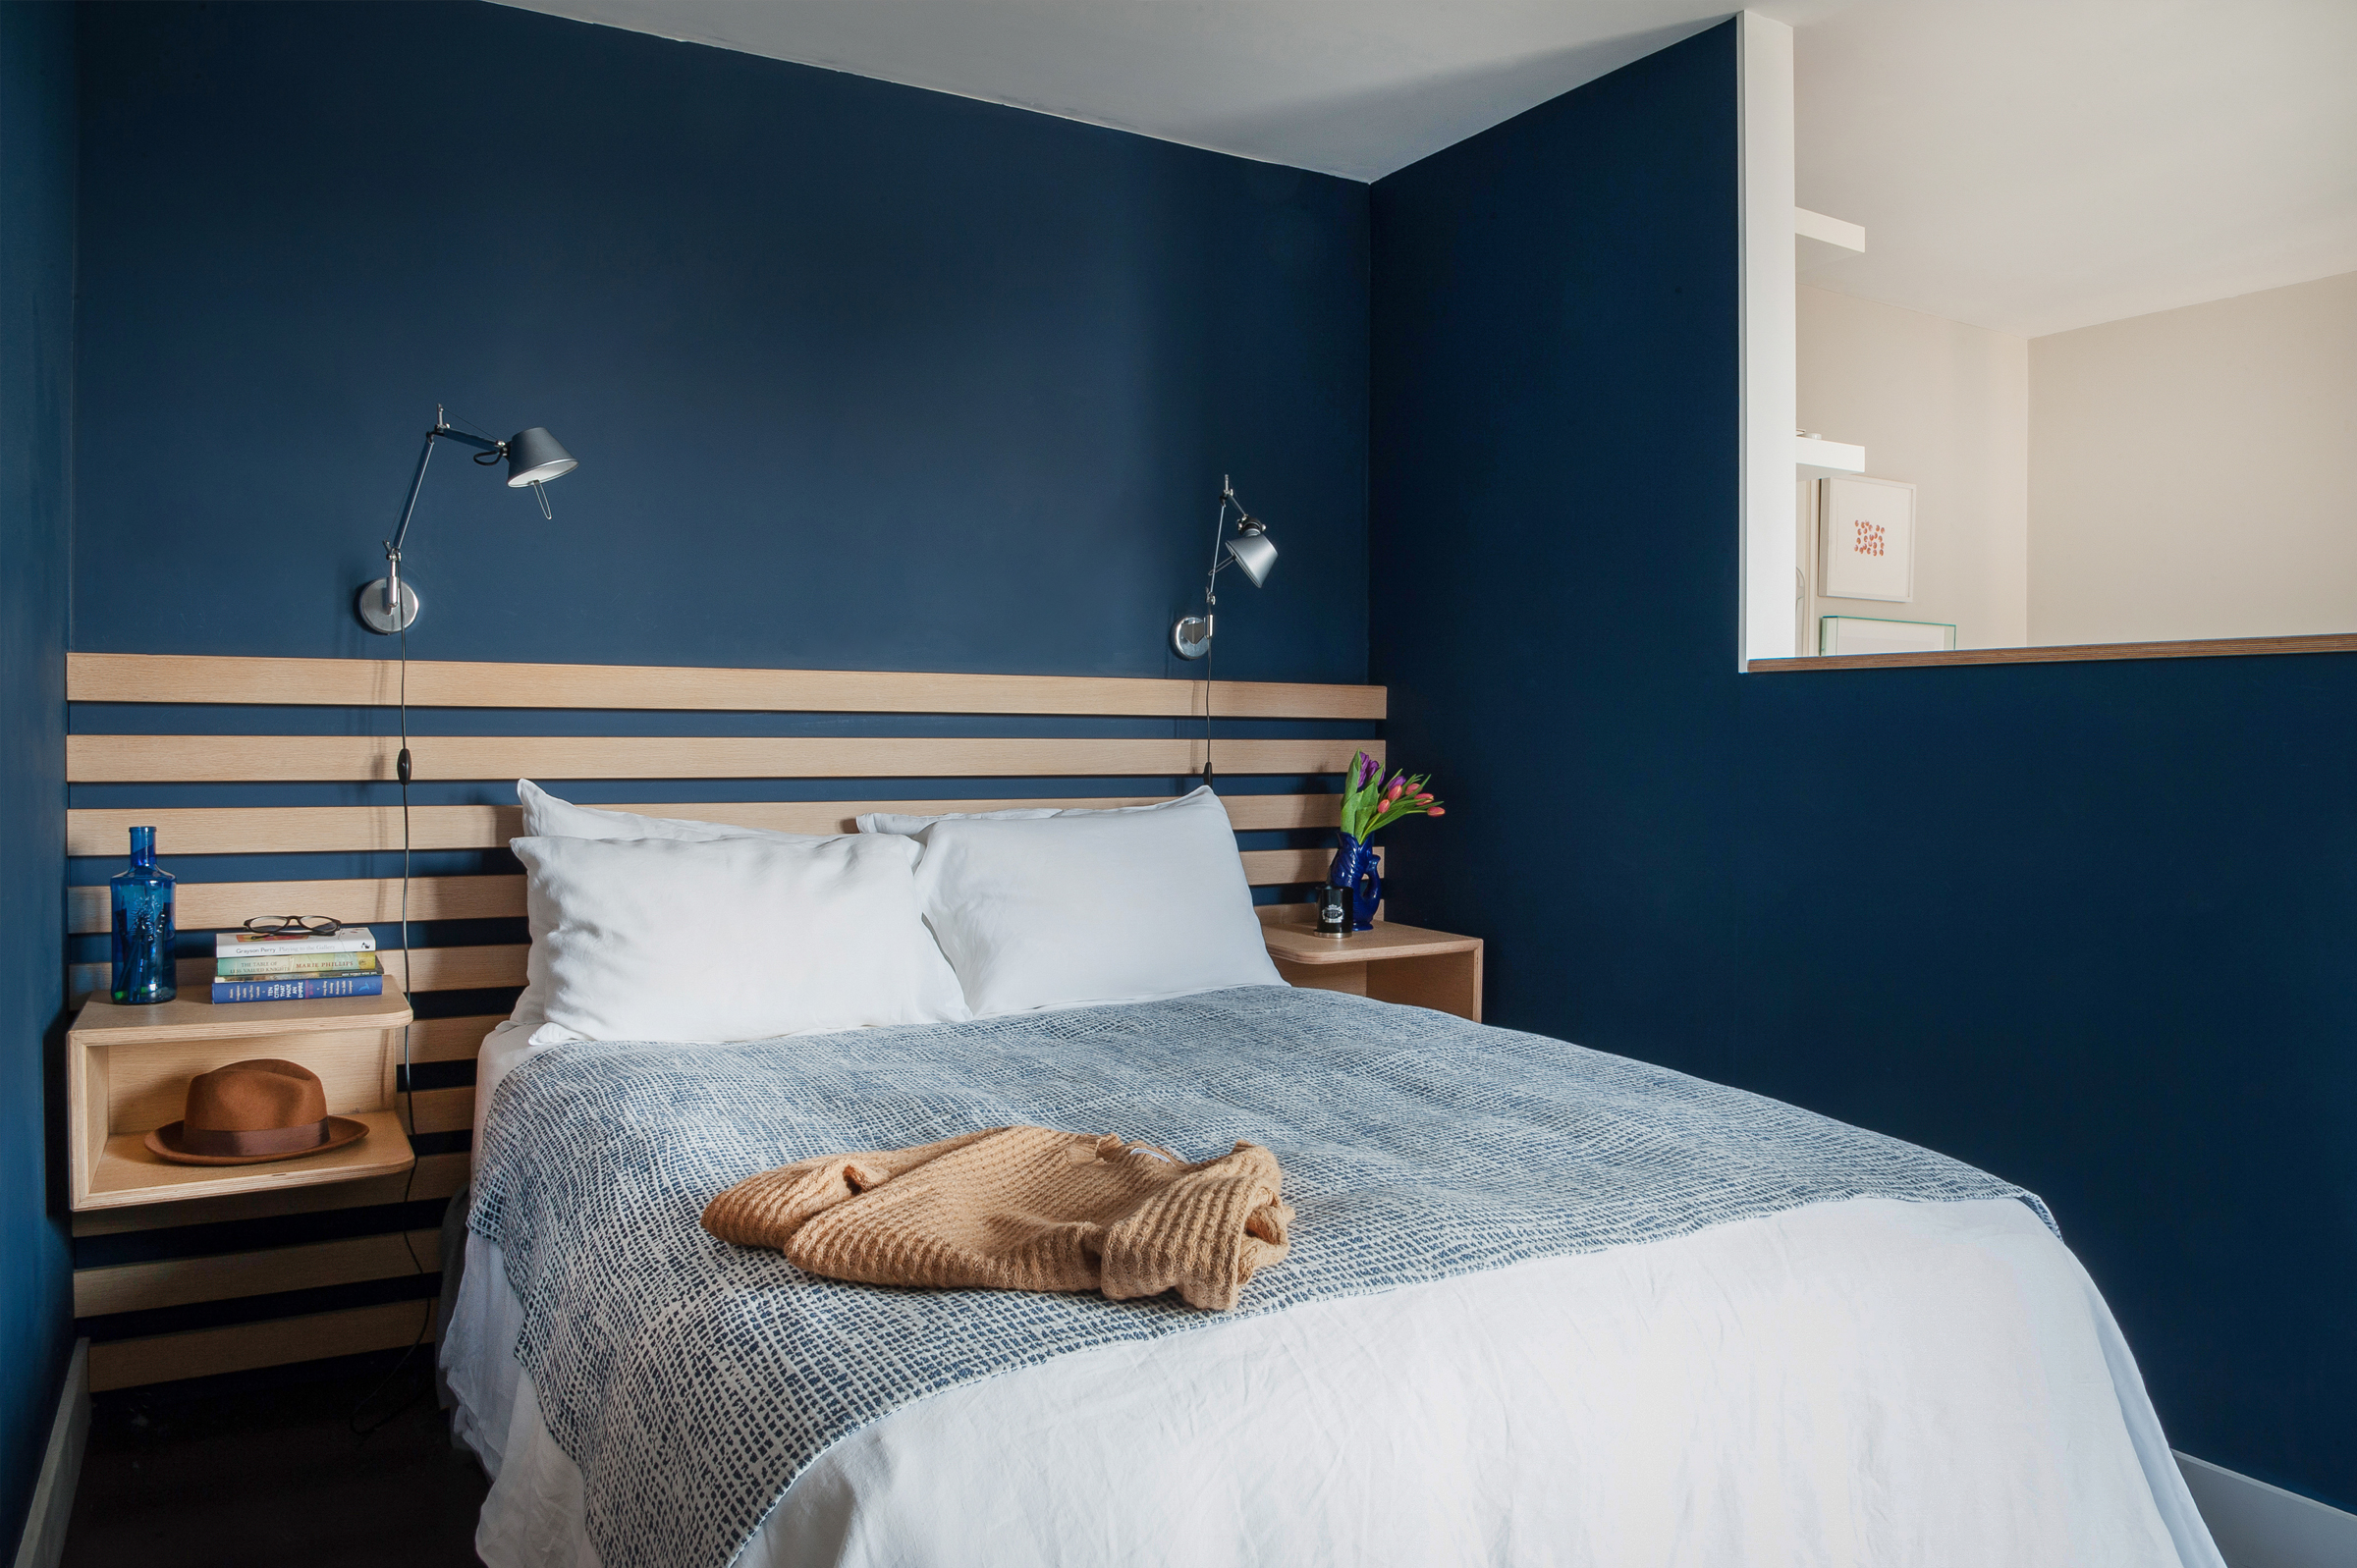 woodcock_bedroom.jpg